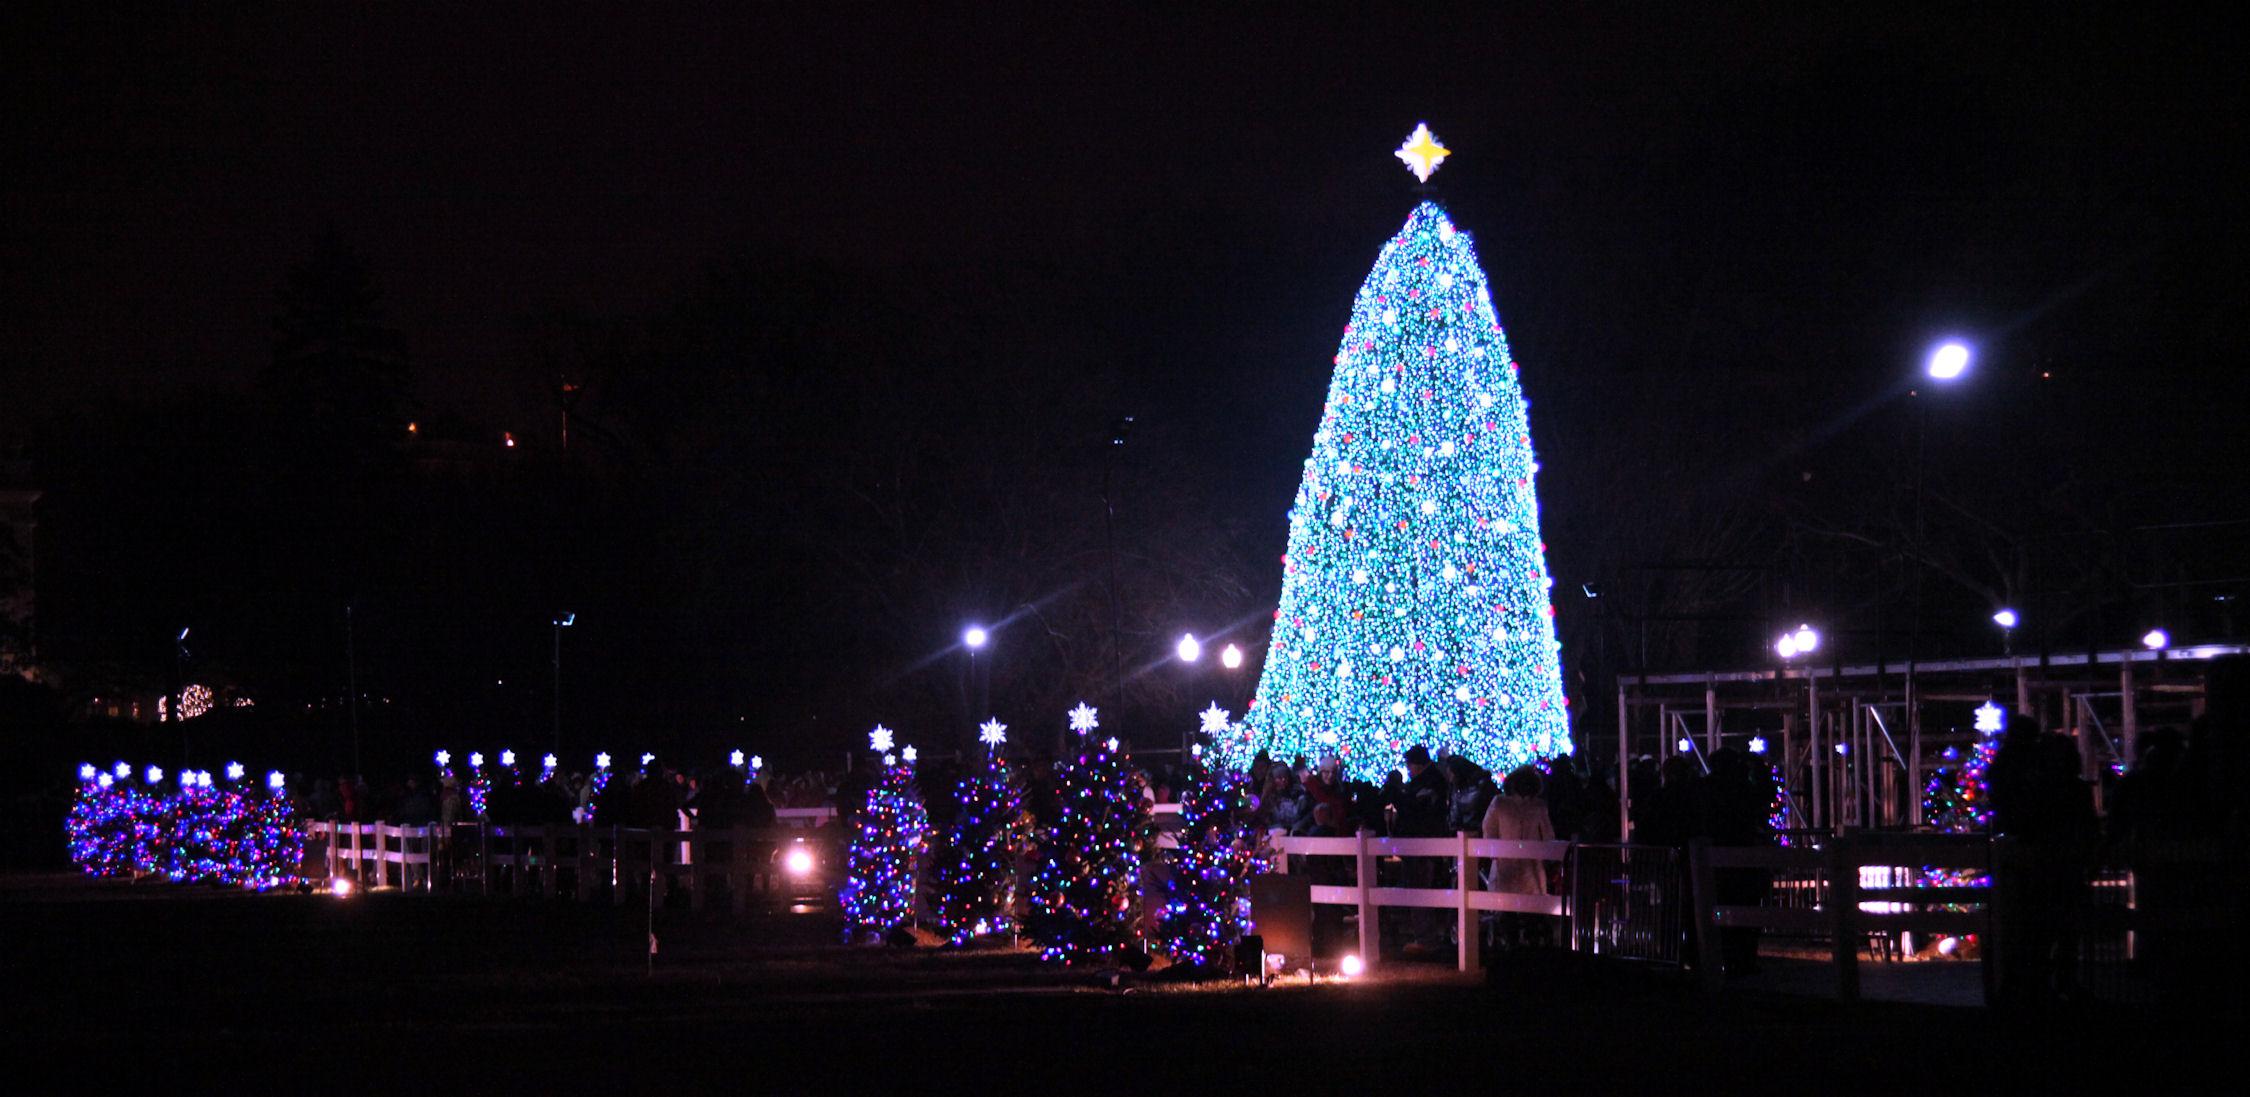 File:US National Christmas Tree 2010.jpg - Wikimedia Commons